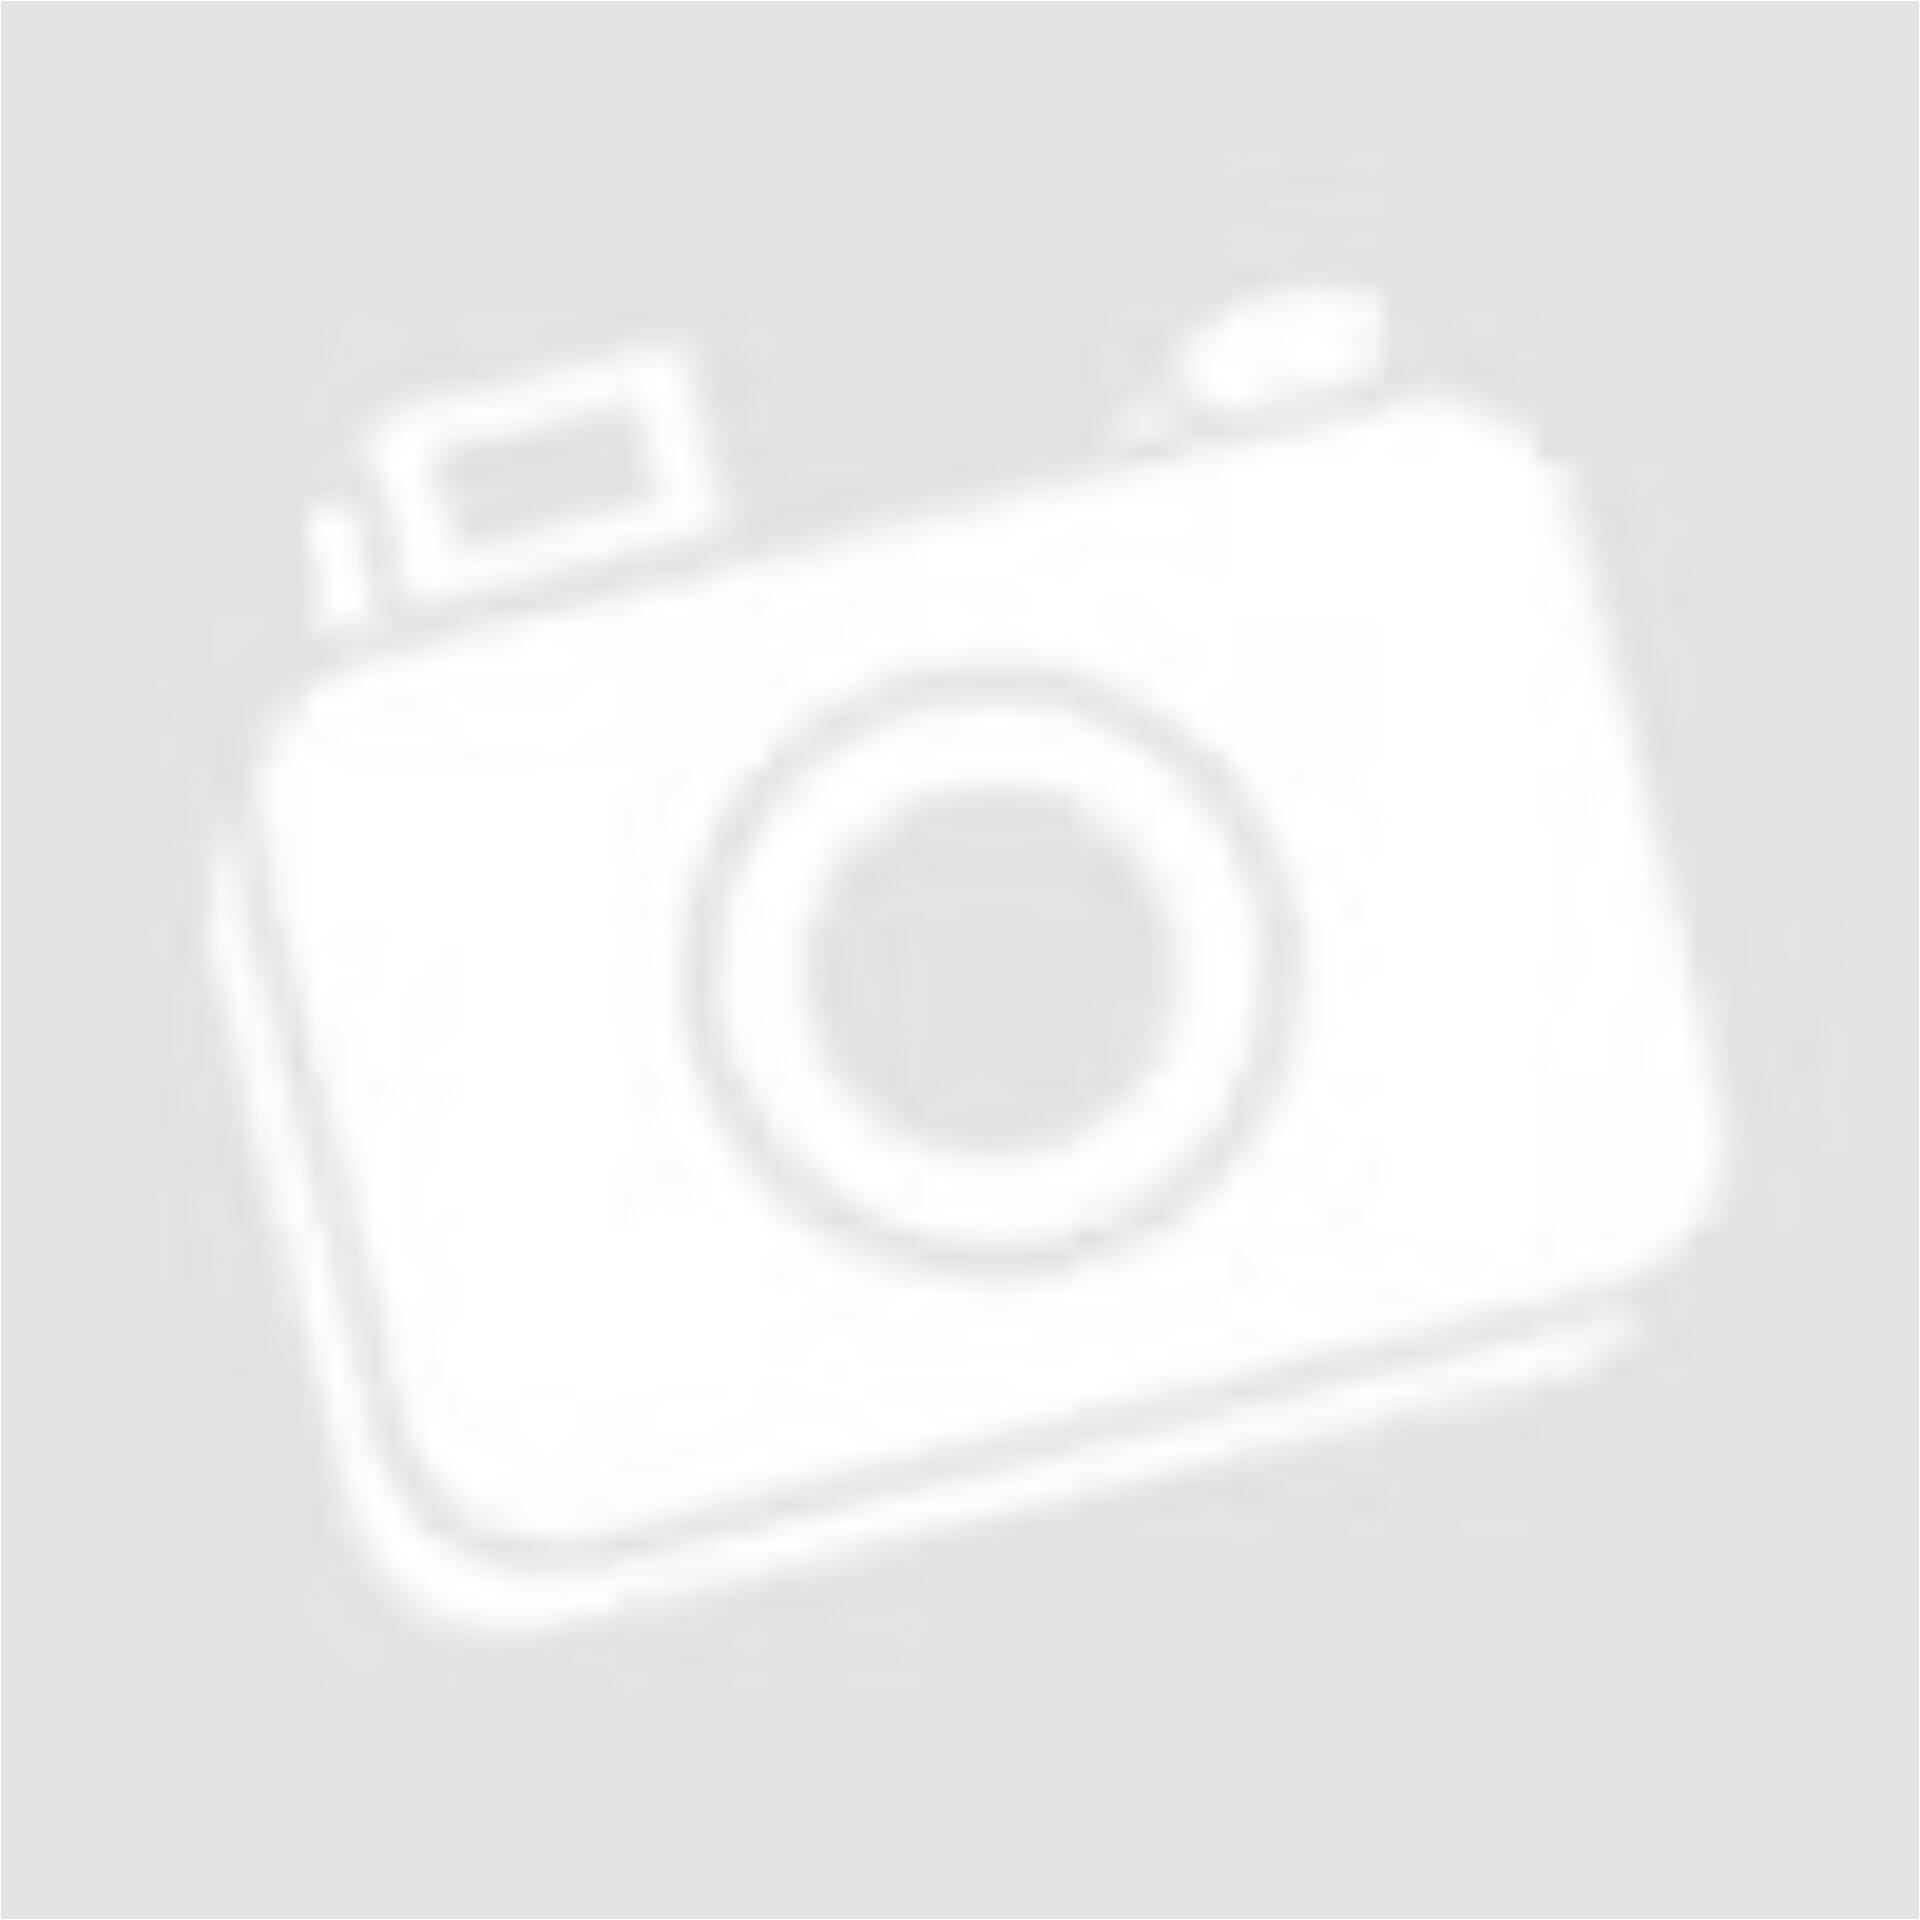 e8b4e54f17 Fehér színű Santa Monica trikó (Méret: S) - Női póló, trikó, topp ...